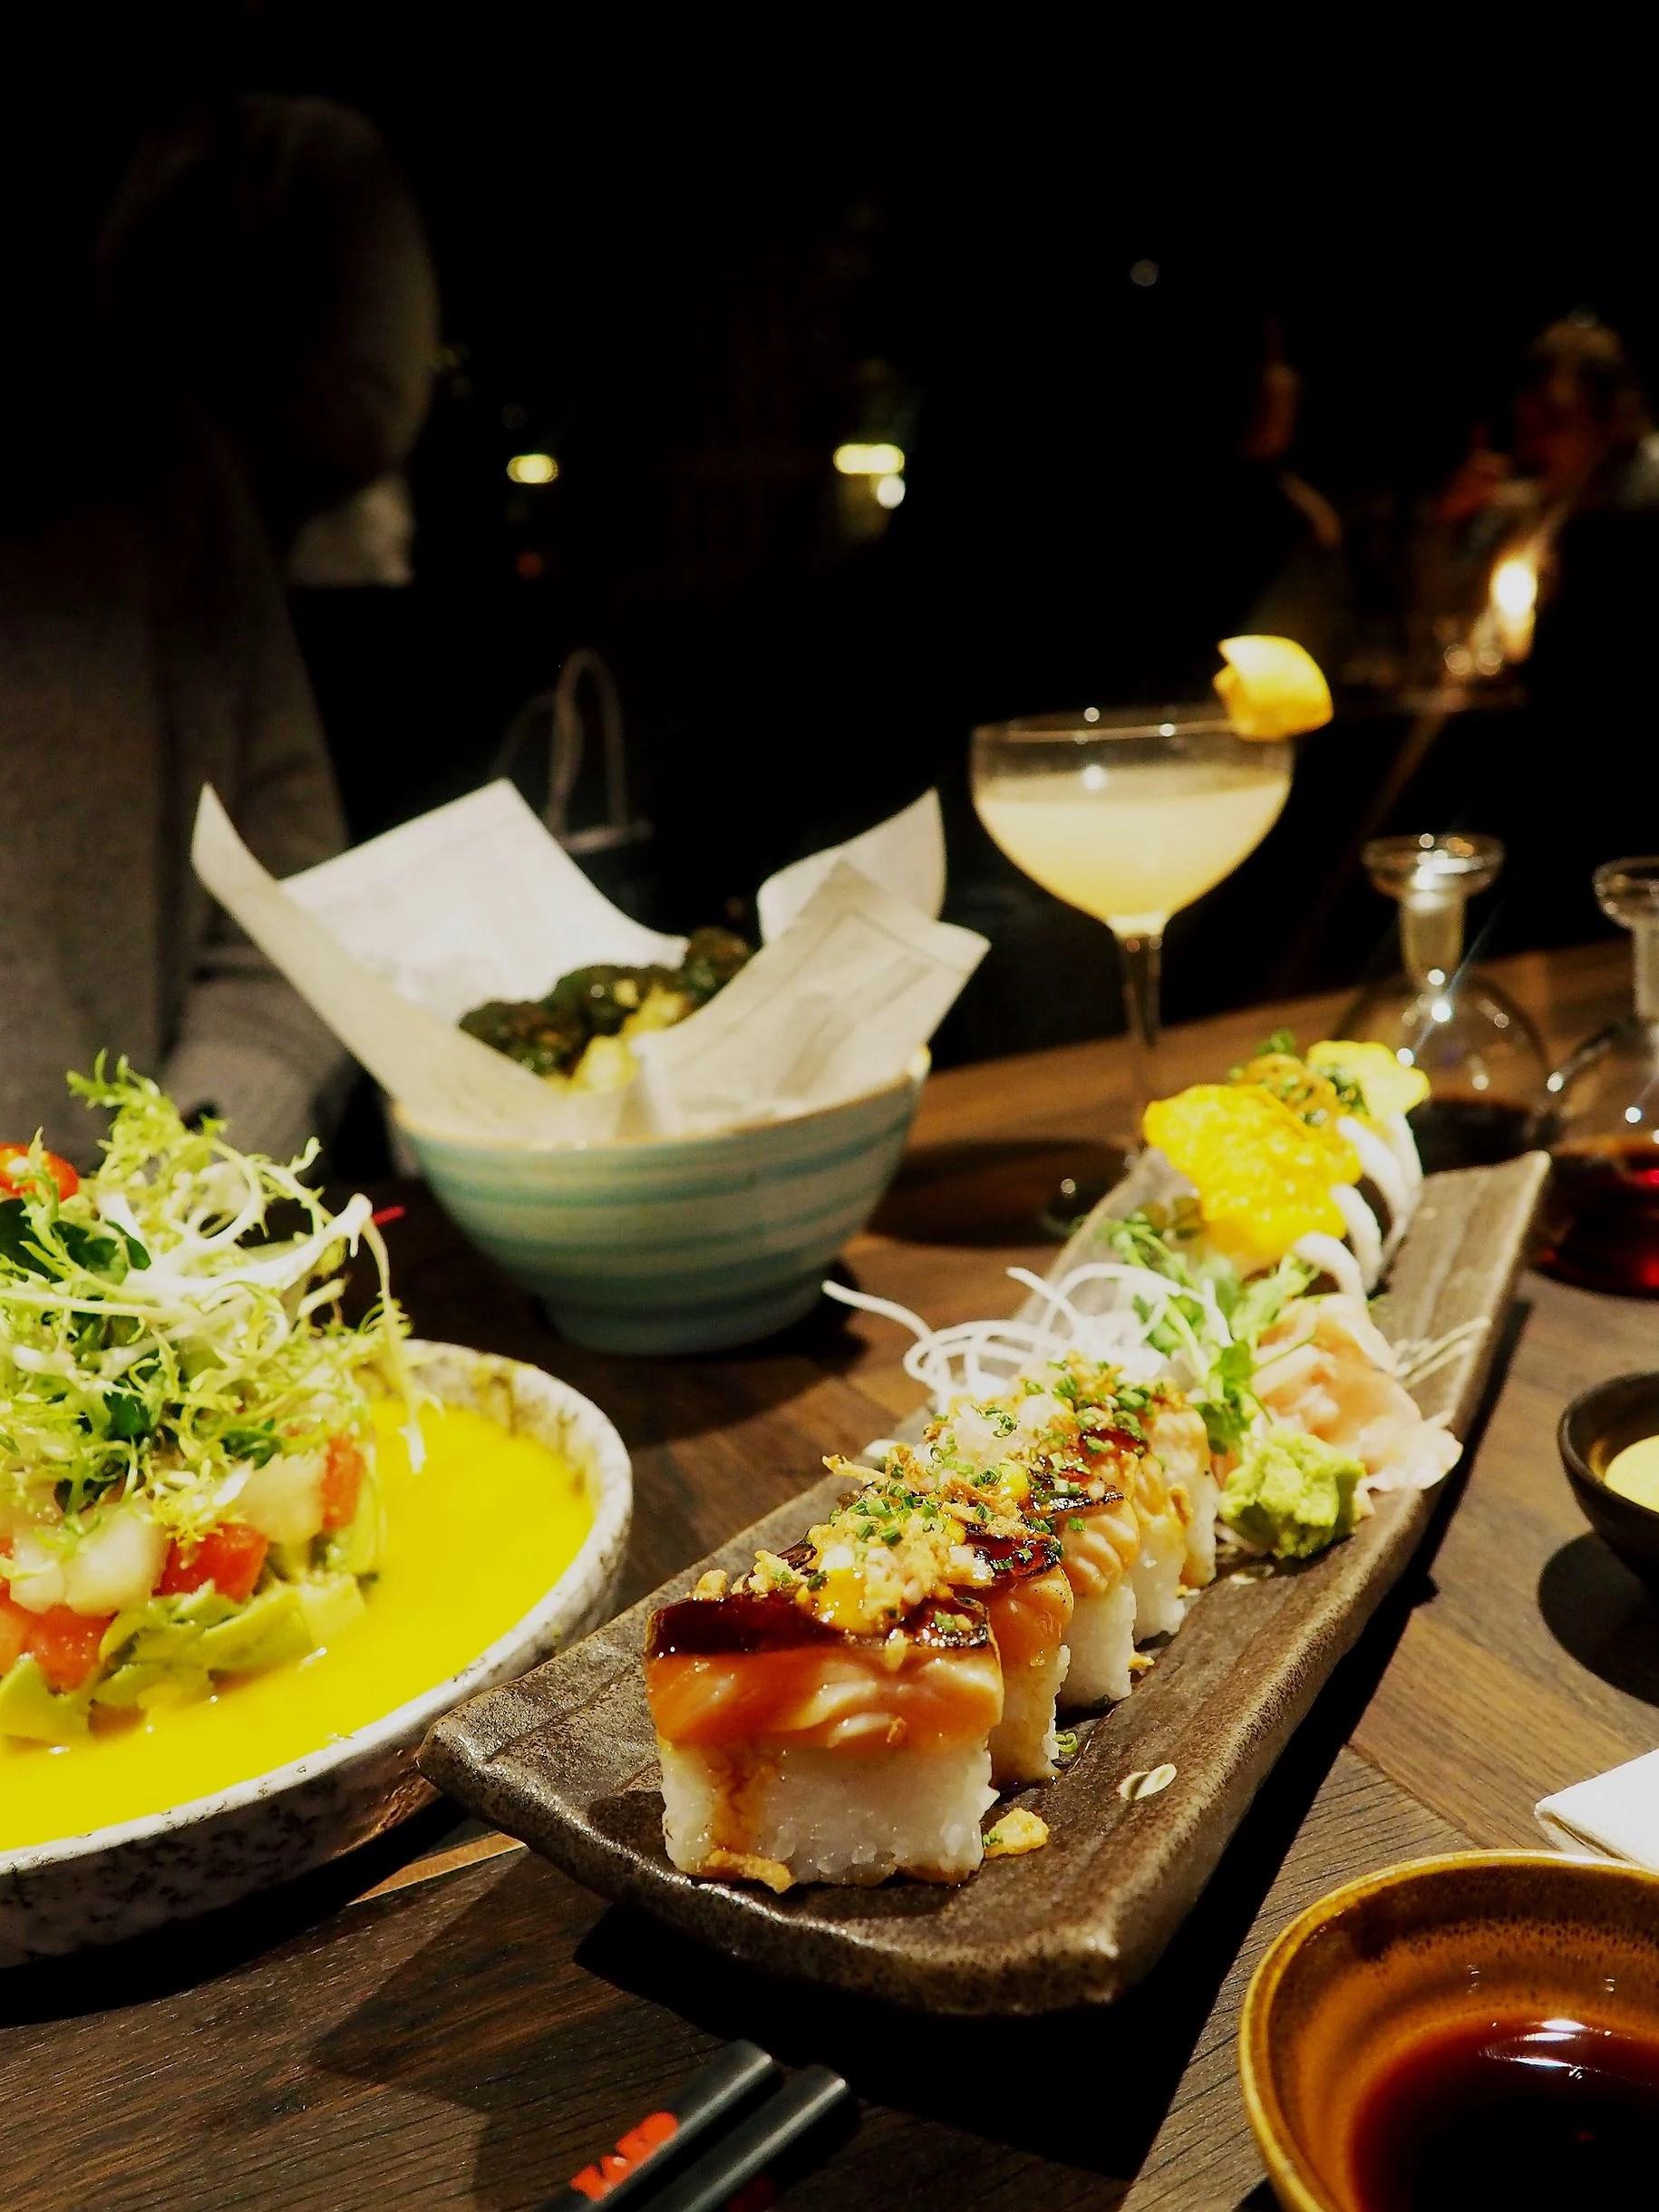 Where to eat? Stockholm - Restaurang TAKO